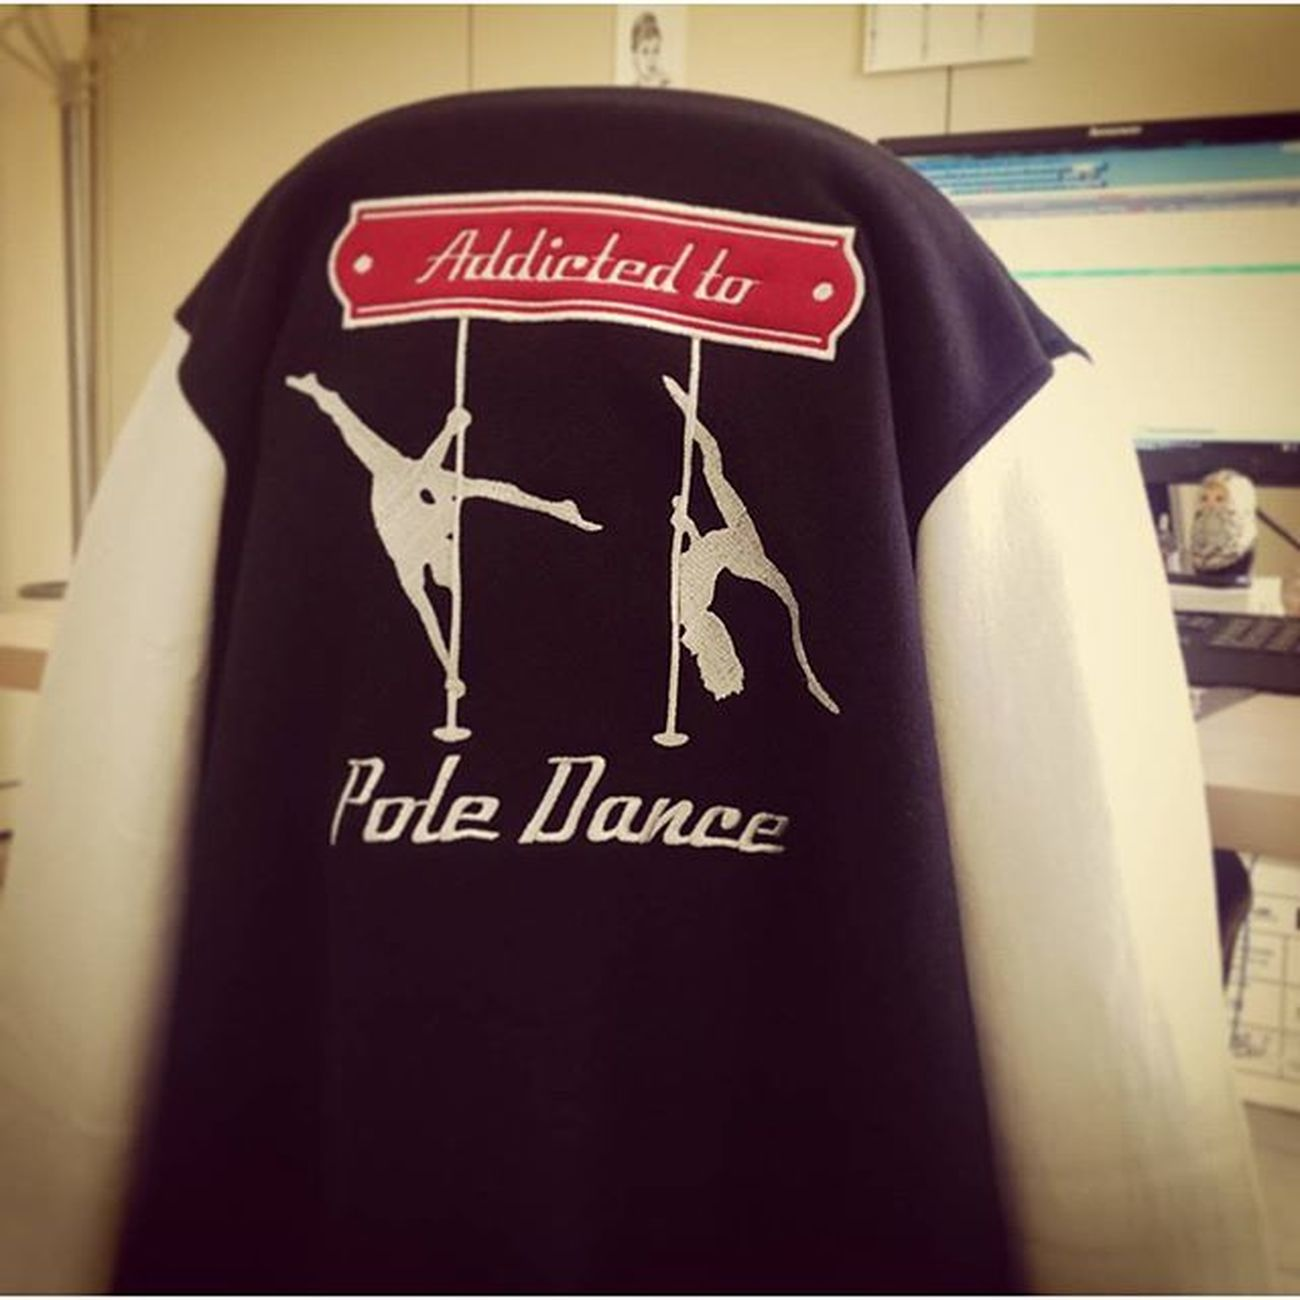 Pole dancers at work 😂😂😂 Poledancebeginners Poledance Poledanceaddicted Poledancersofinstagram poledancemania nopainnogain palonontitemo chiara0palo1 poledanceratwork chiara chasingmydreams celapossofareforse poledancer